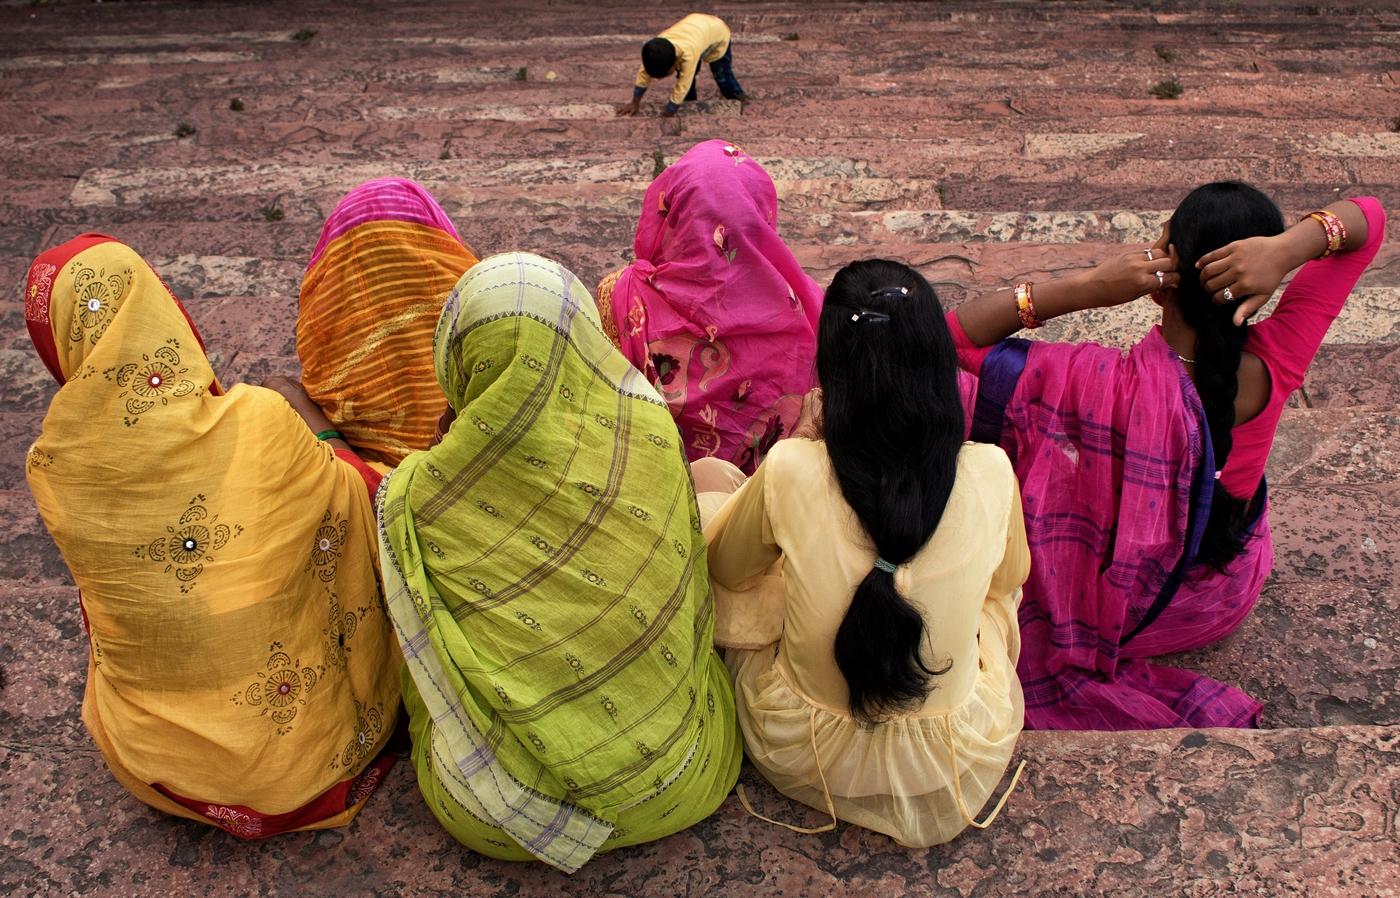 Barevná Indie